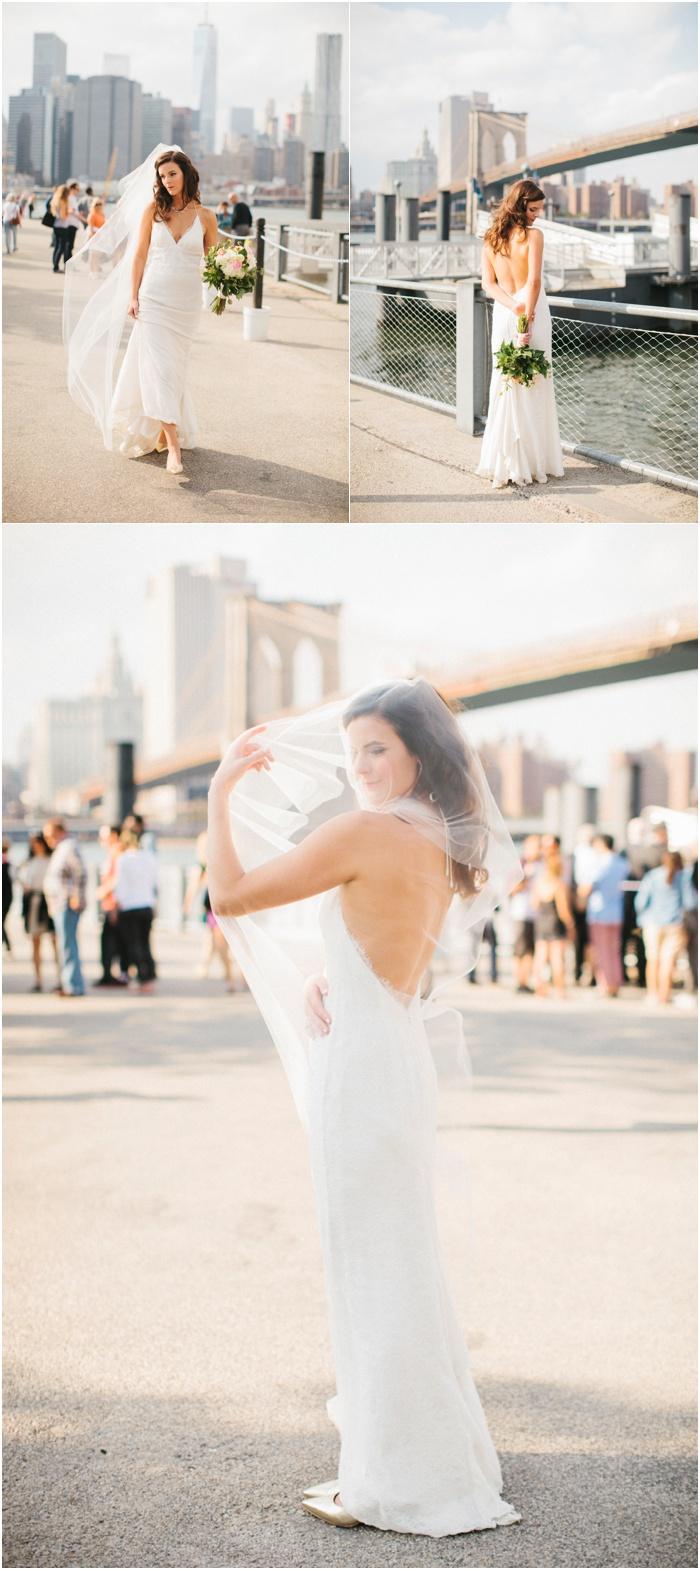 06_new york wedding photographer.jpeg